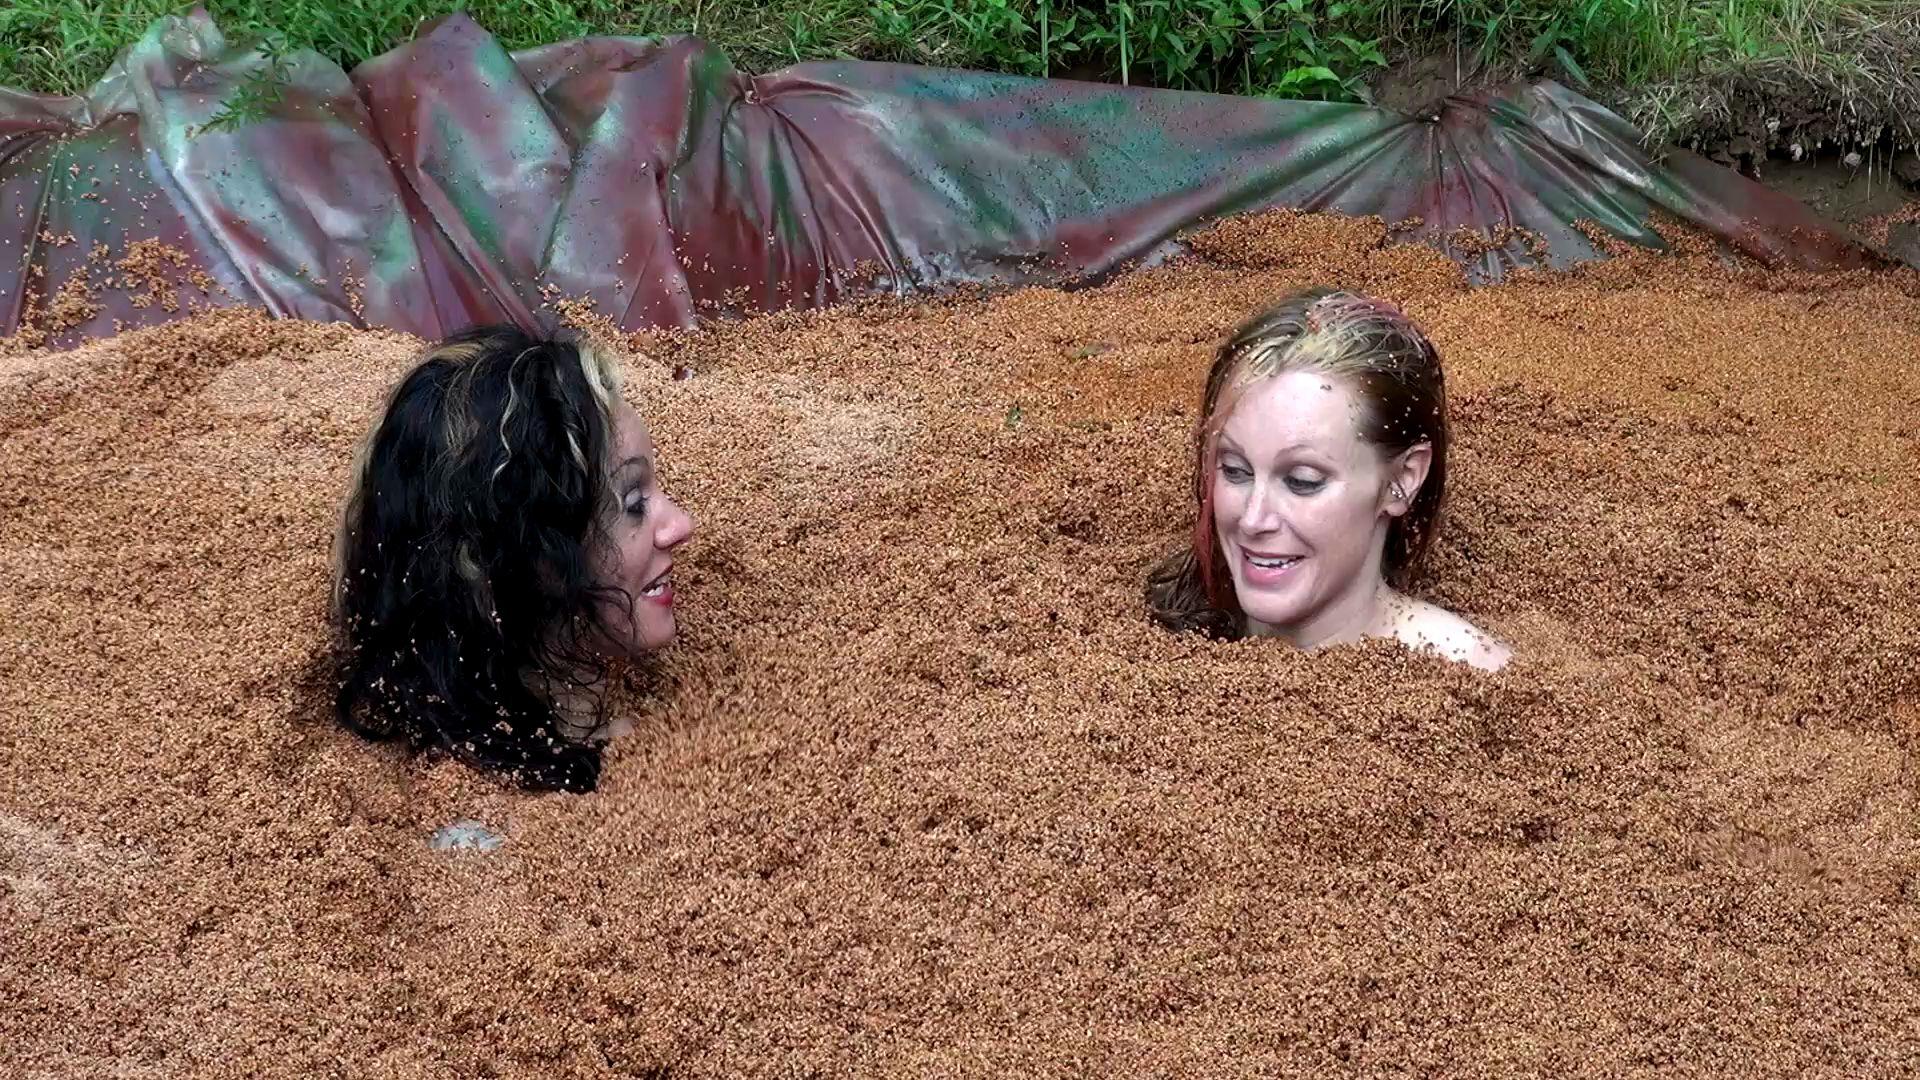 Gummi Big Boobs Quicksand Hollywood-quicksand-the-begin_22